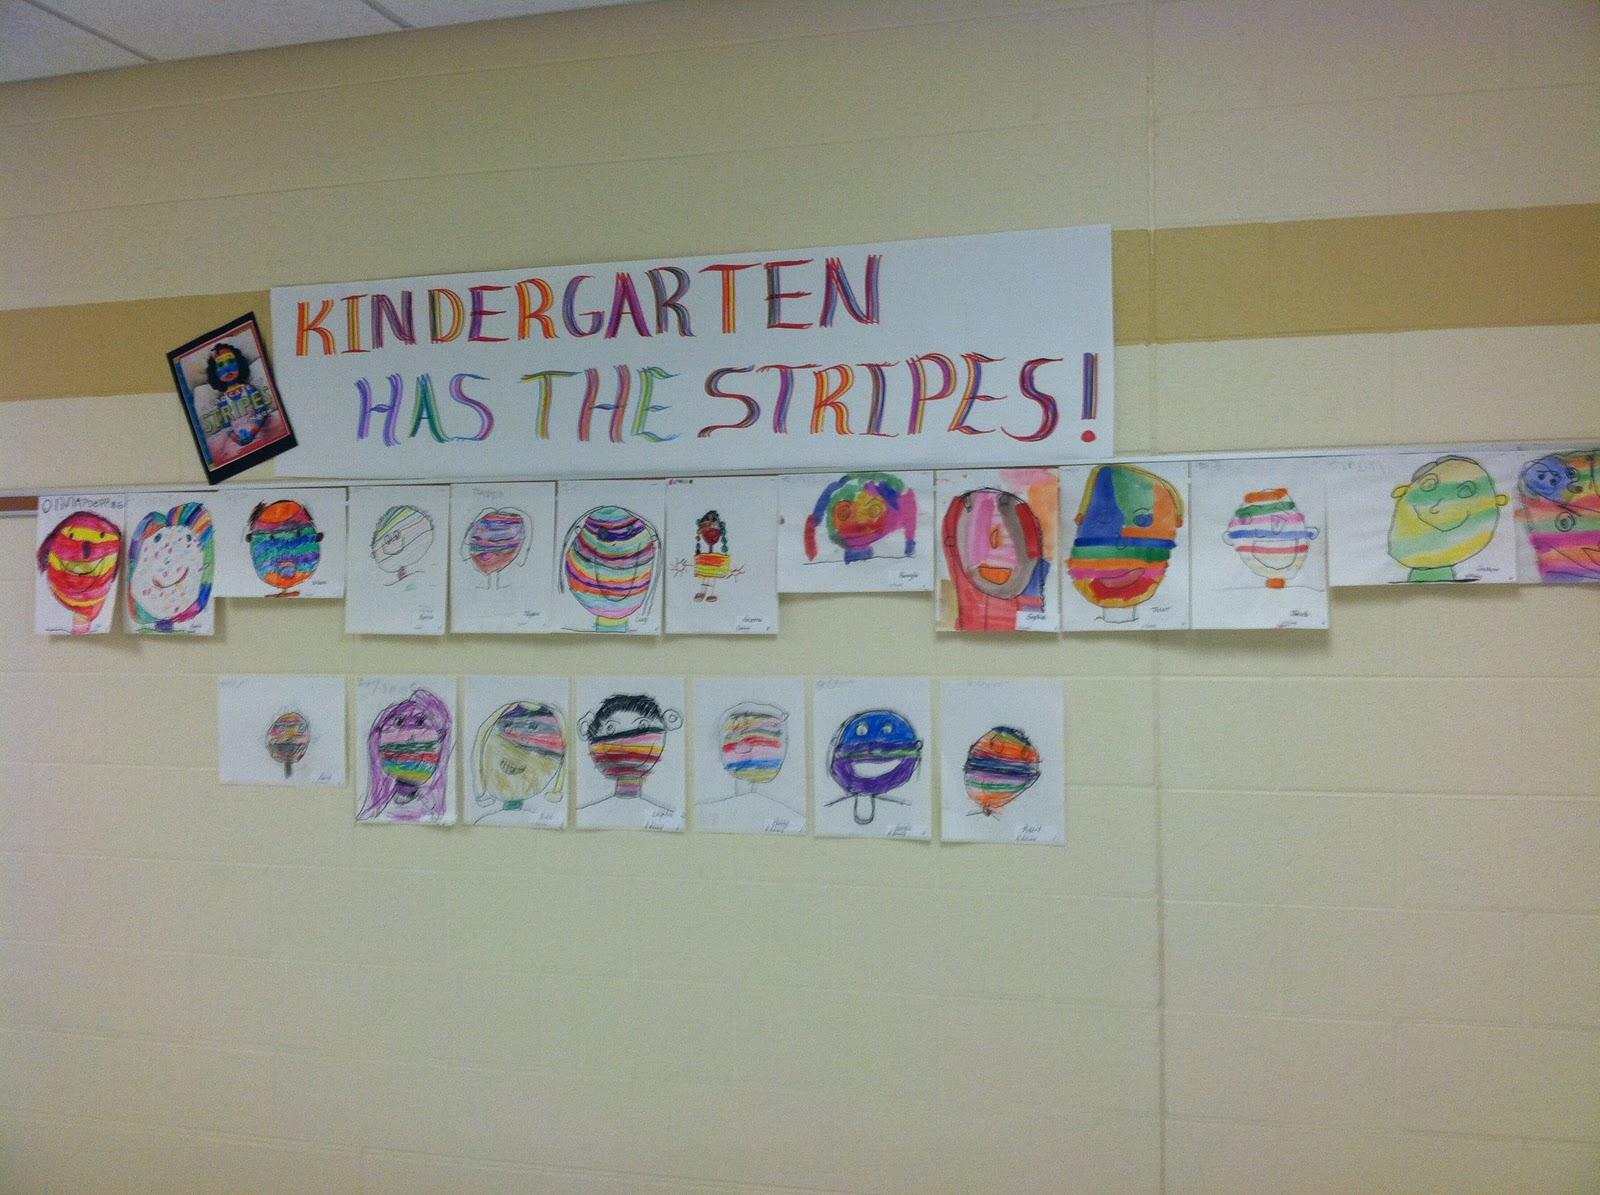 O\'Neill\'s Art Room: Kindergarten Has the Stripes!